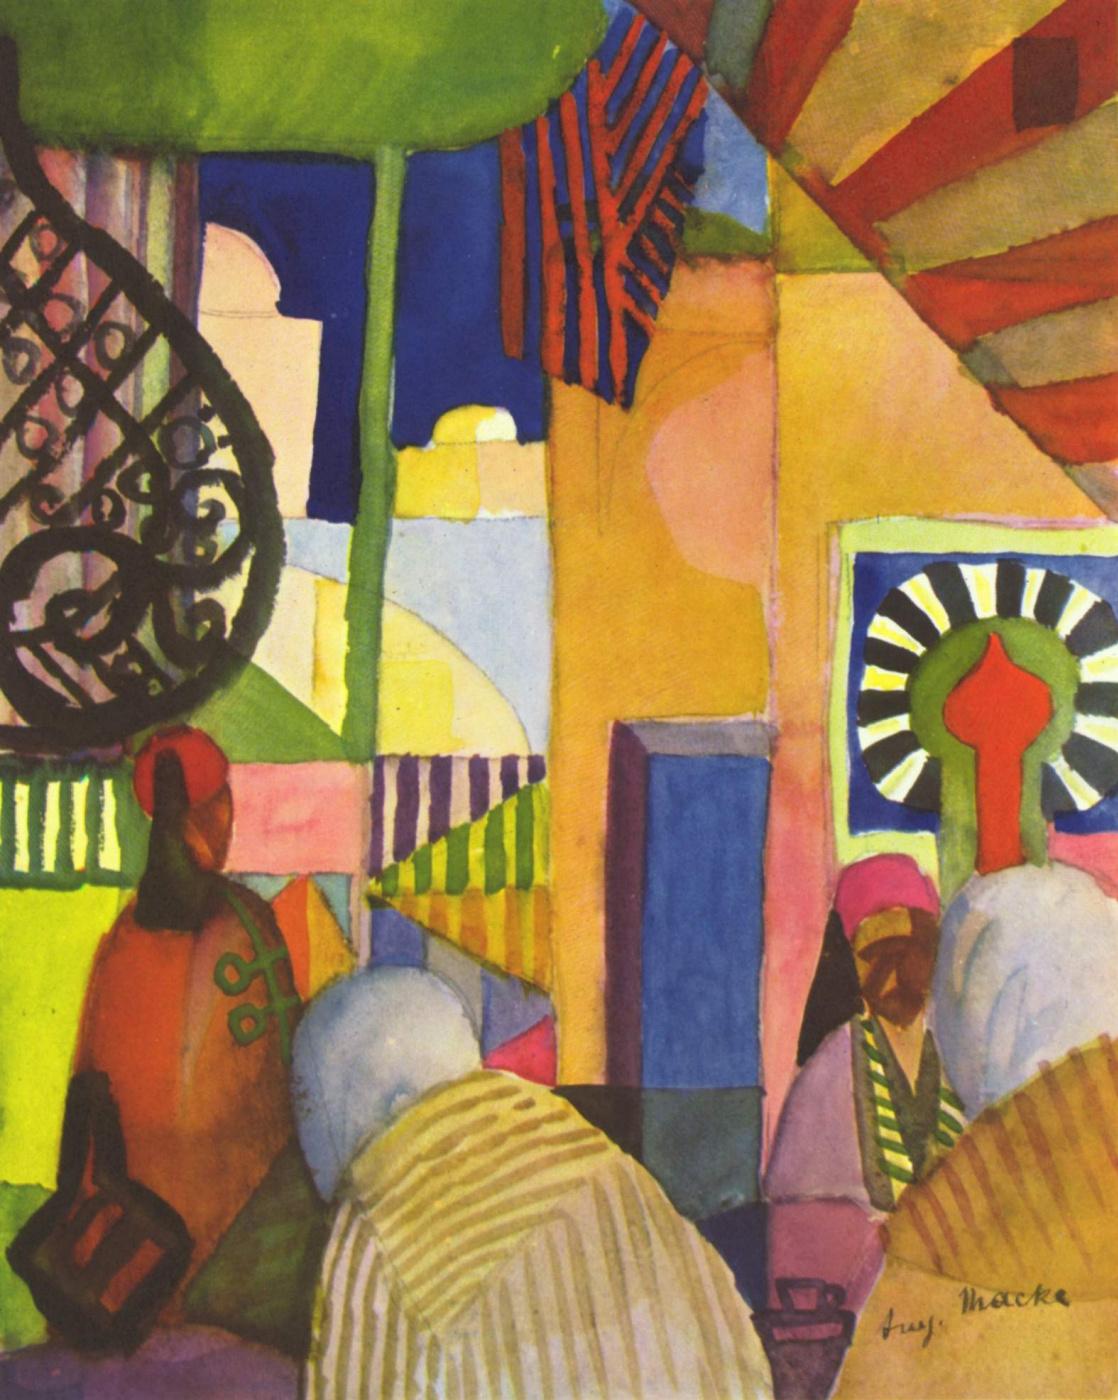 August Macke. On the market